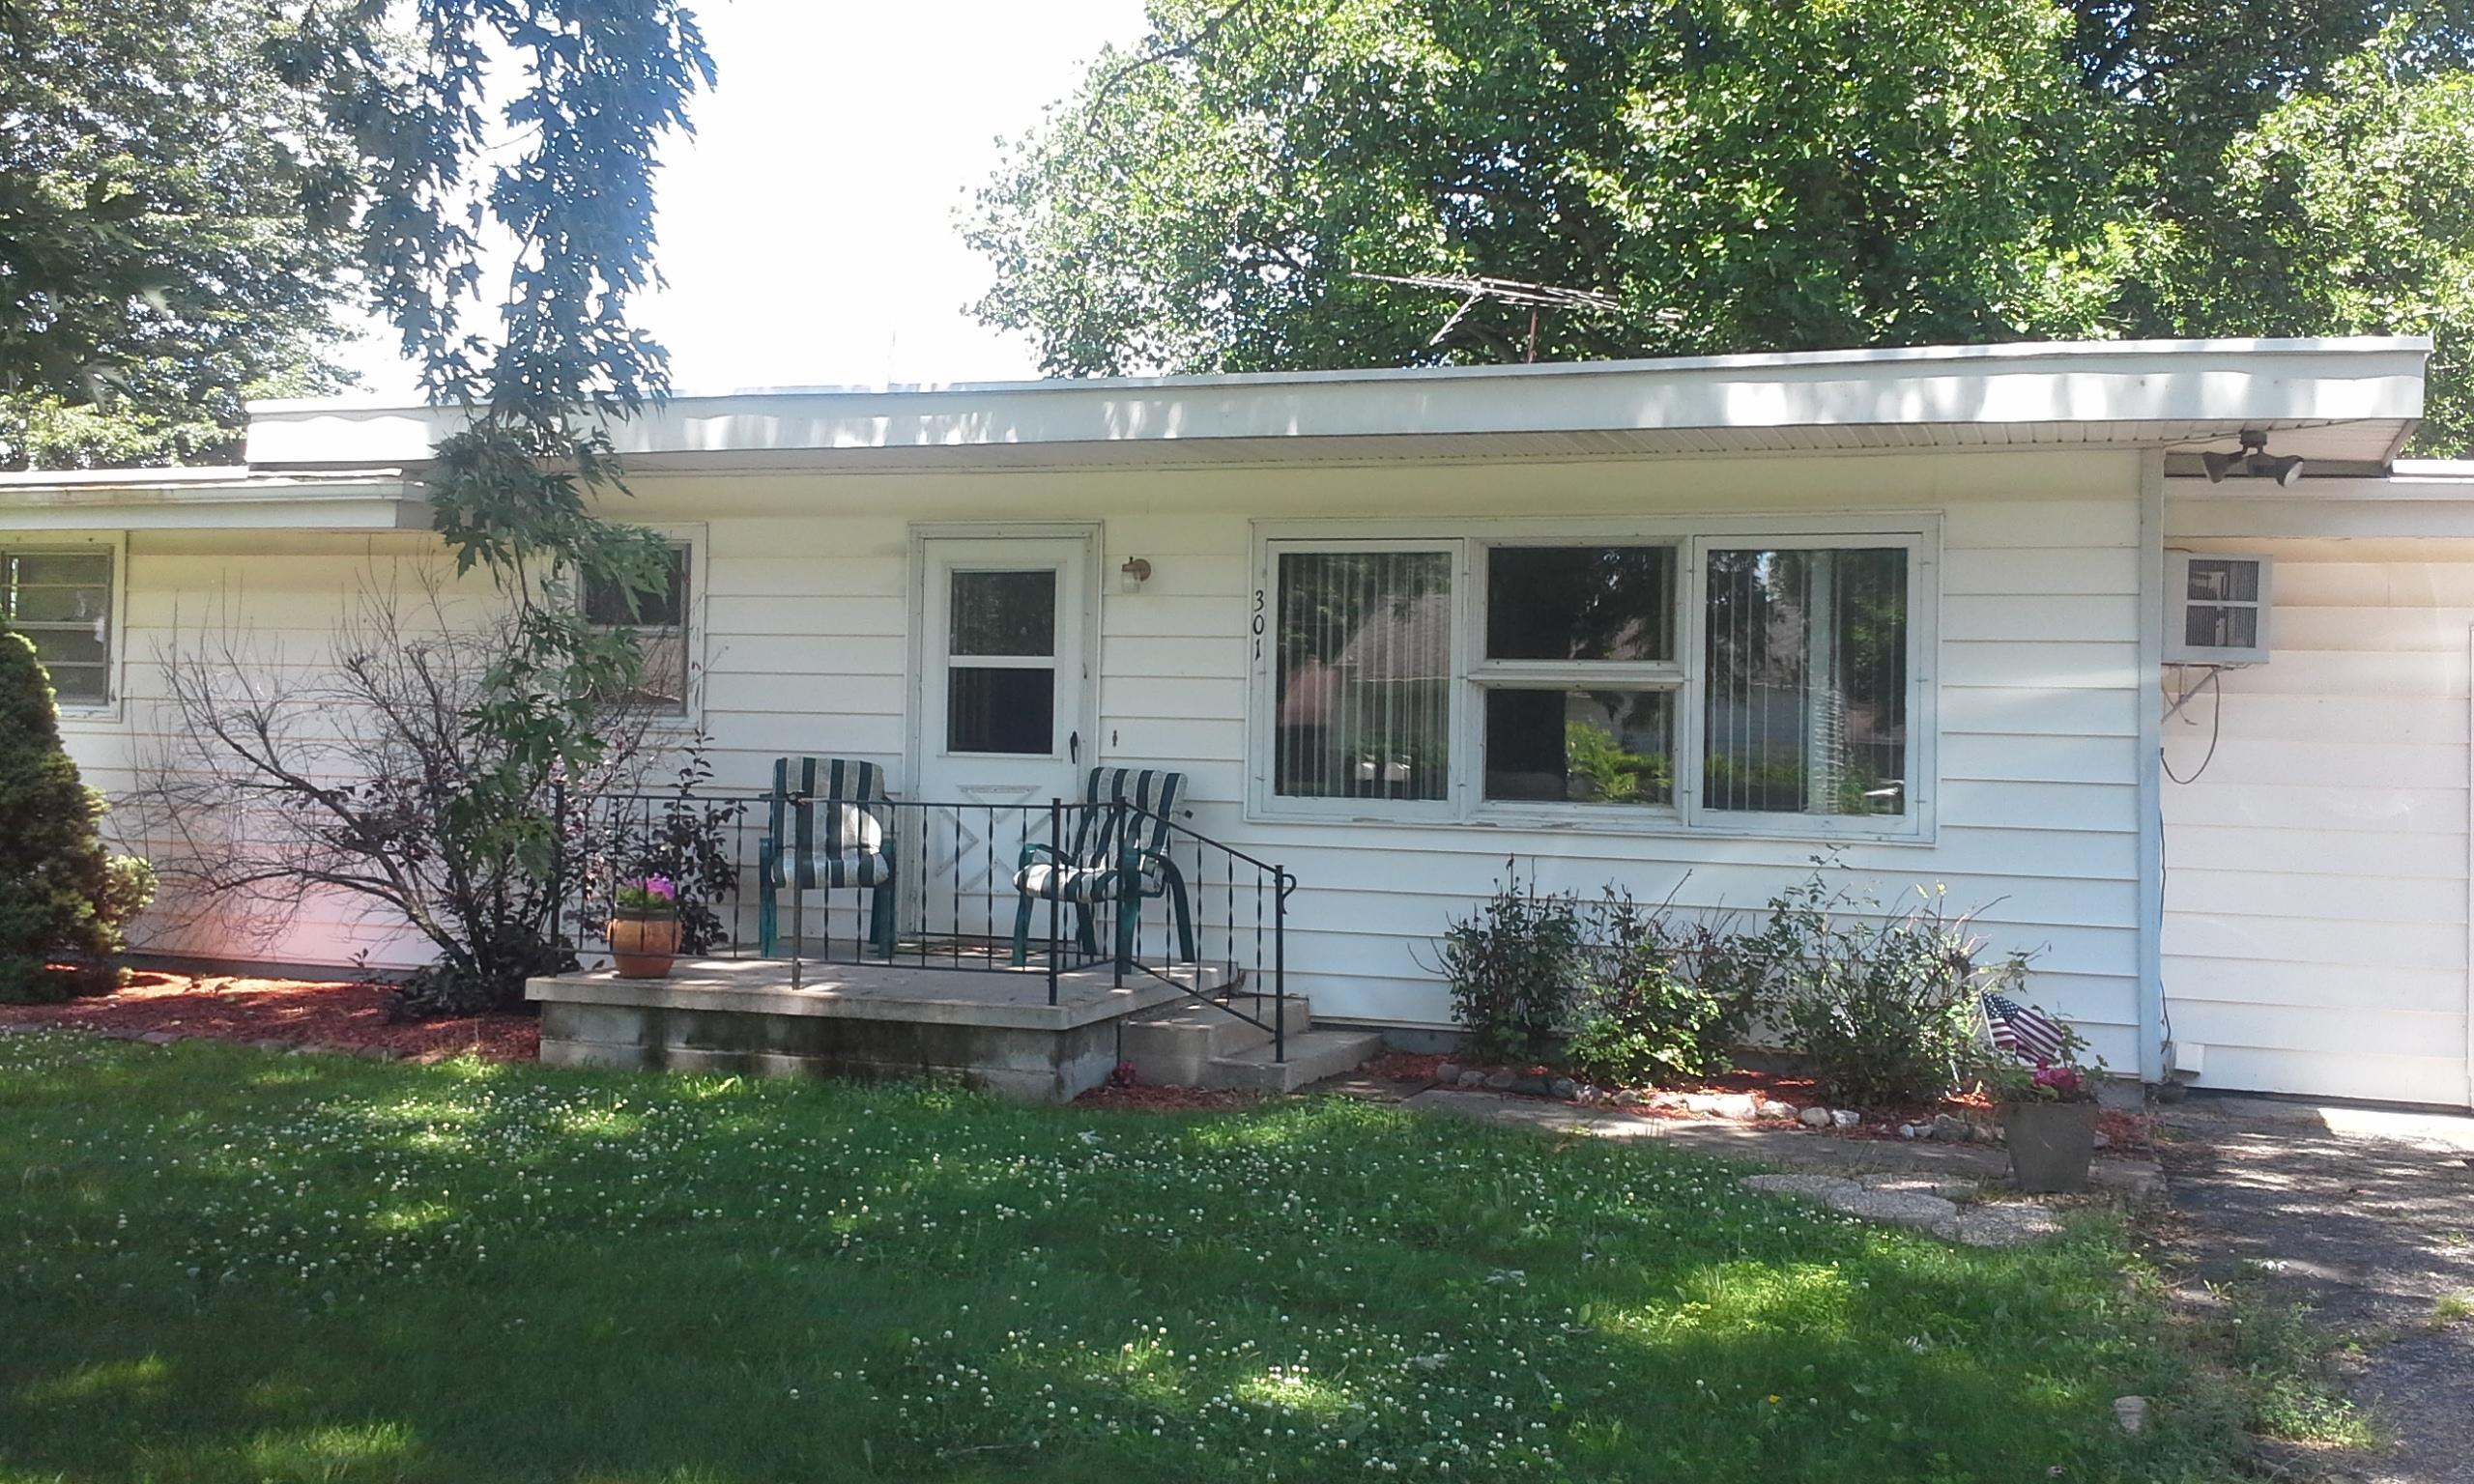 301 E. Lewis Street, Swayzee, Indiana 46986